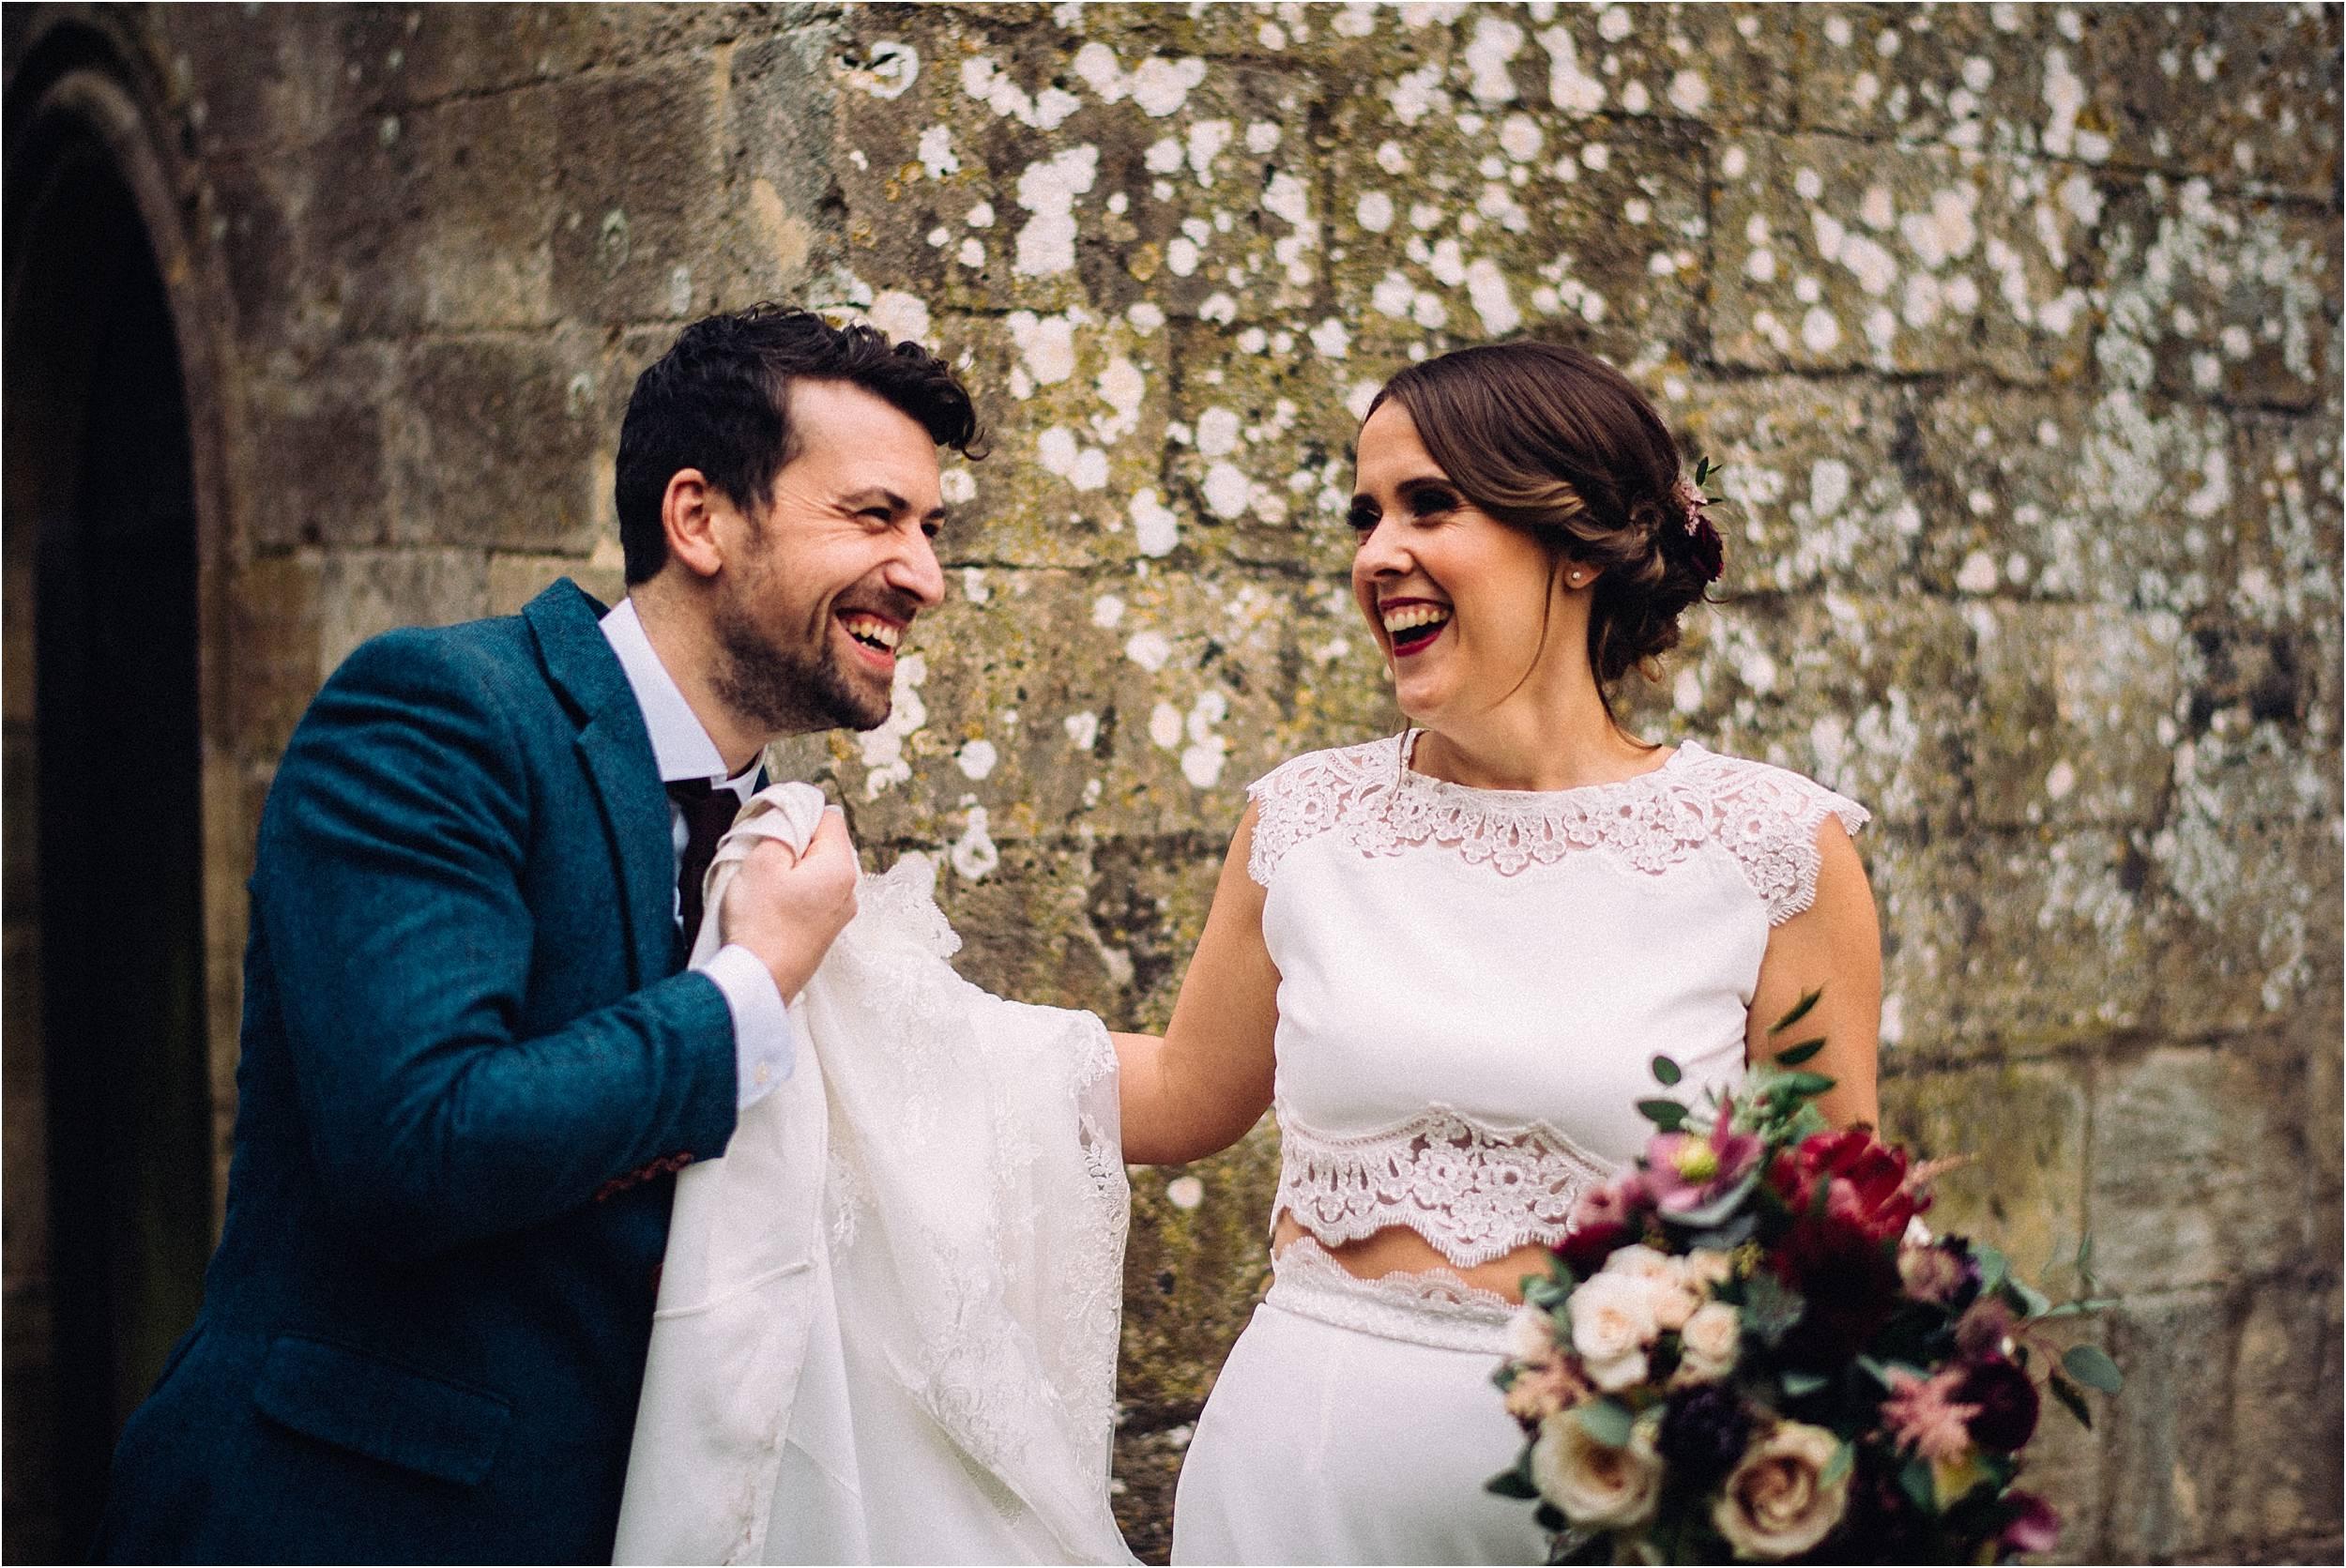 Cowley Manor Cotswolds Wedding Photographer_0060.jpg